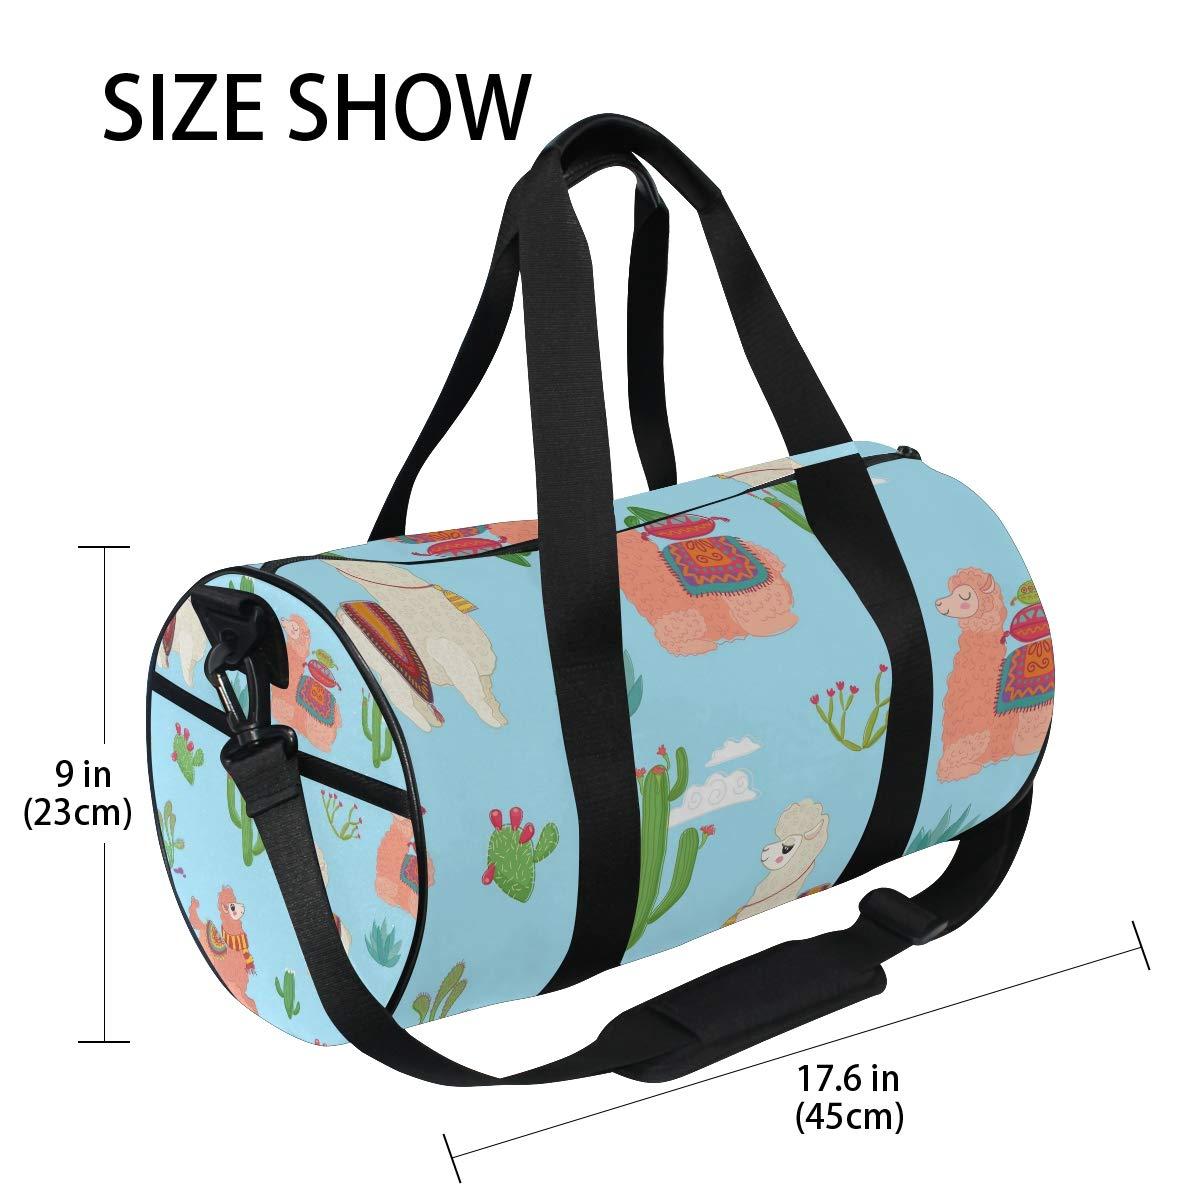 Llama Unisex's Duffel Bag Travel Tote Luggage Bag Gym Sports Luggage Bag by EVERUI (Image #4)